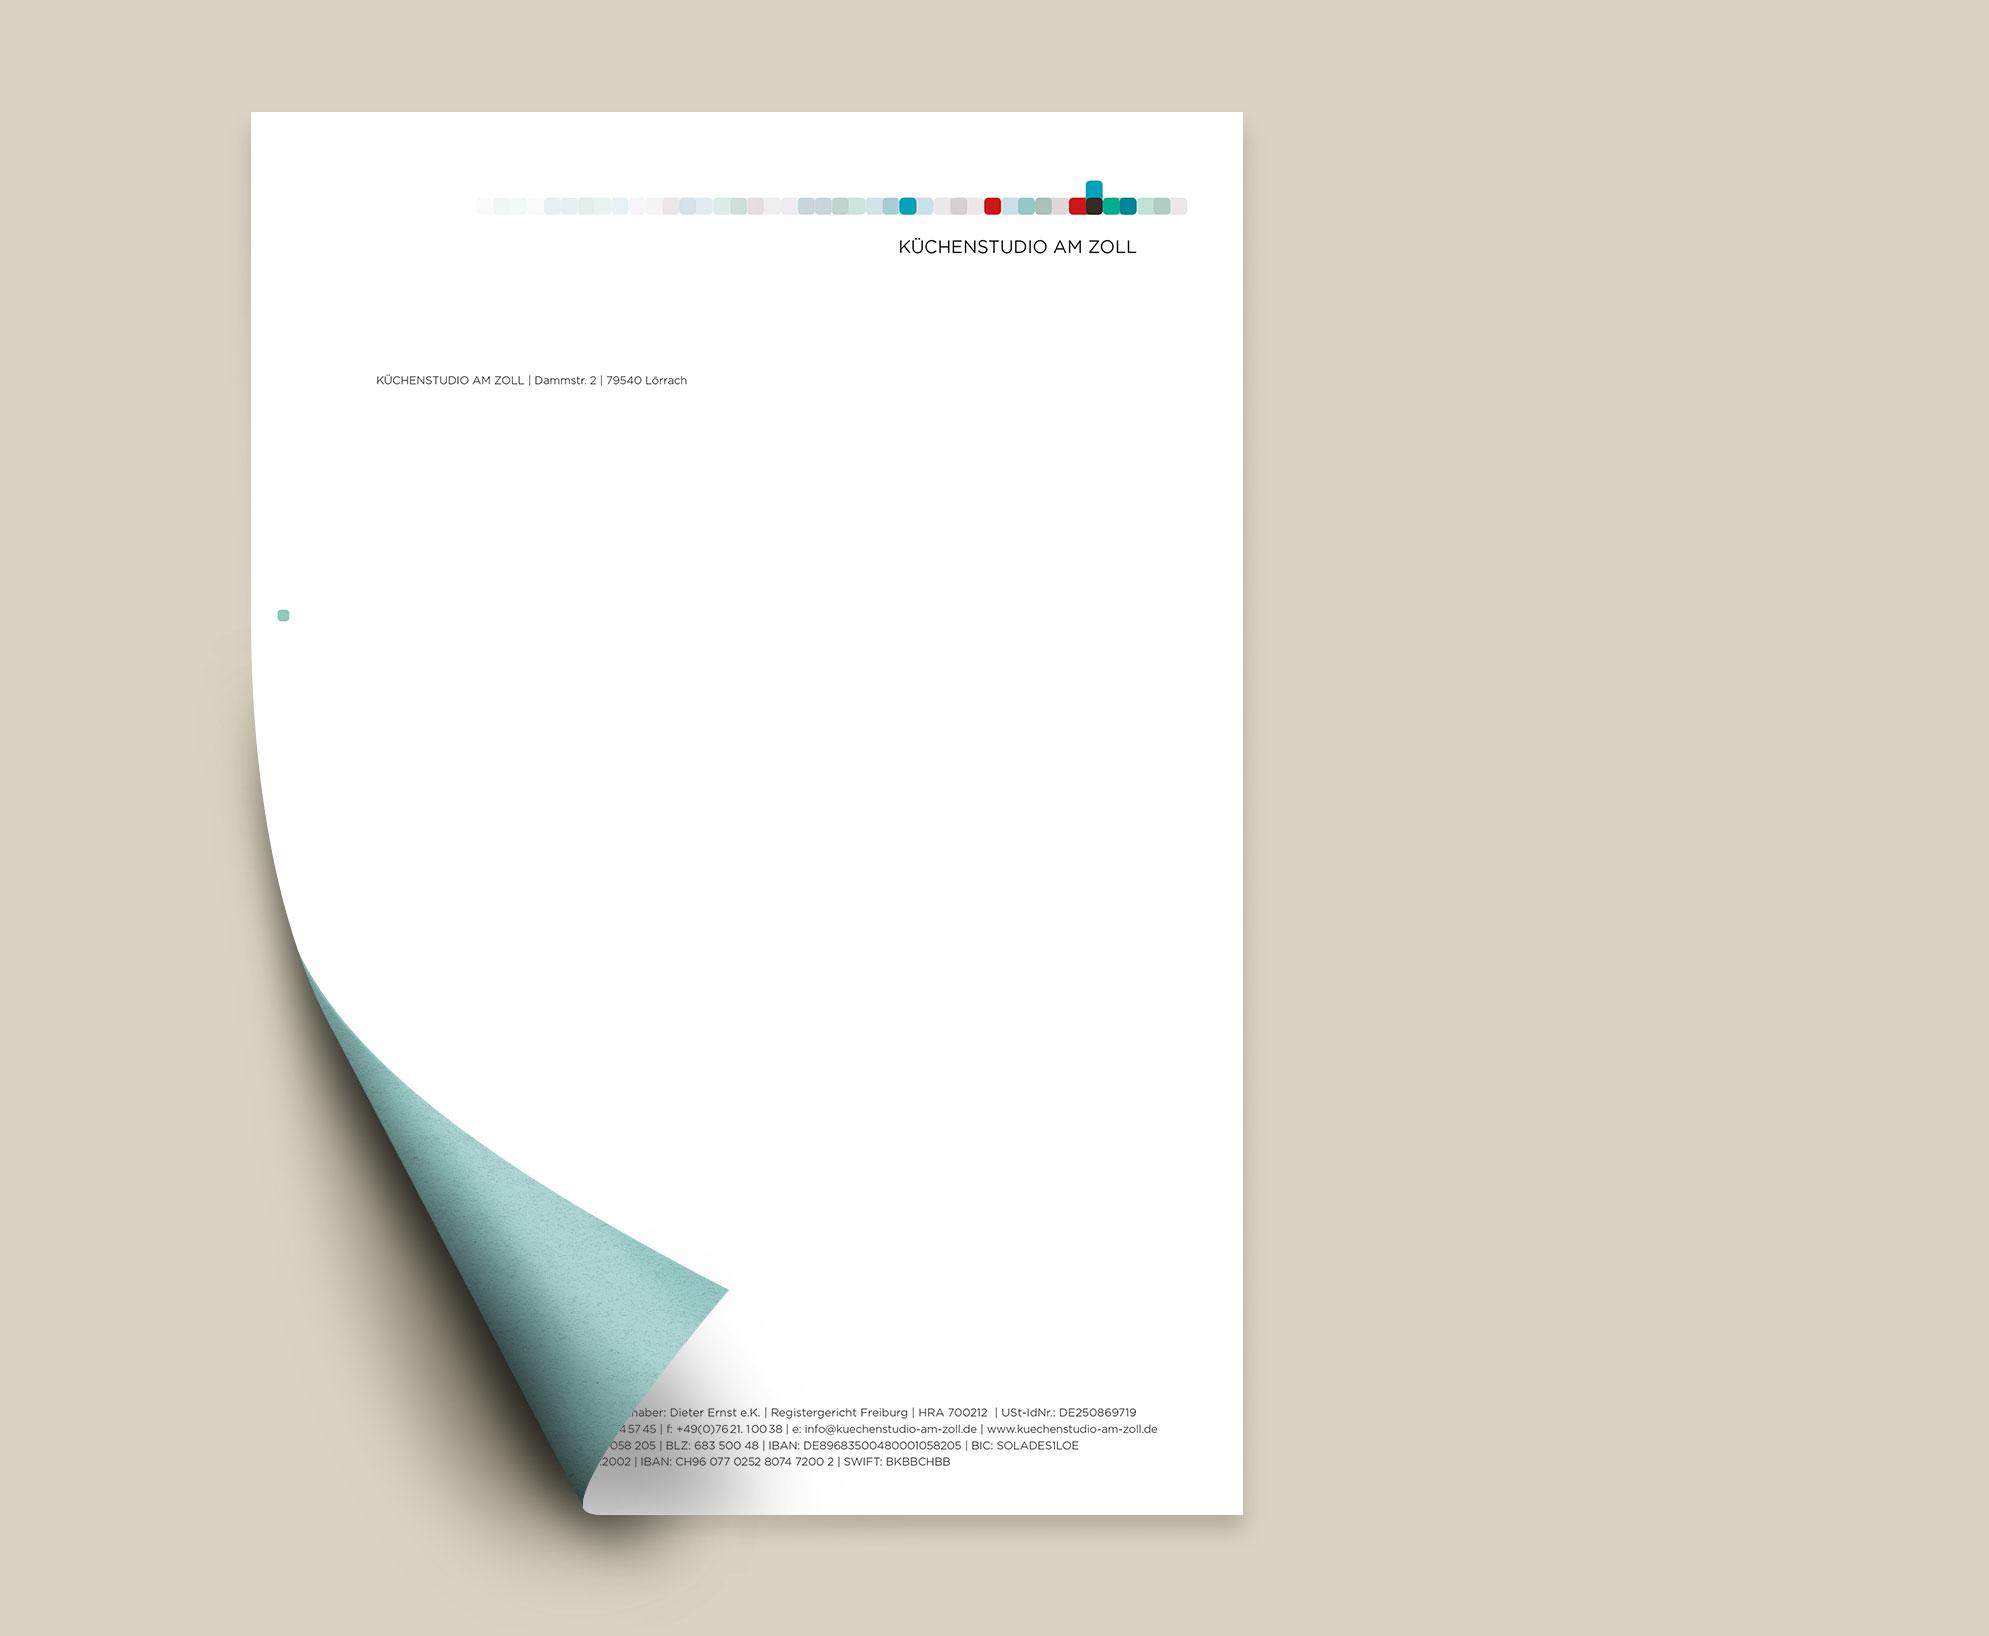 Kuechenstudio_Zoll_Briefpapier_Simulation_Web